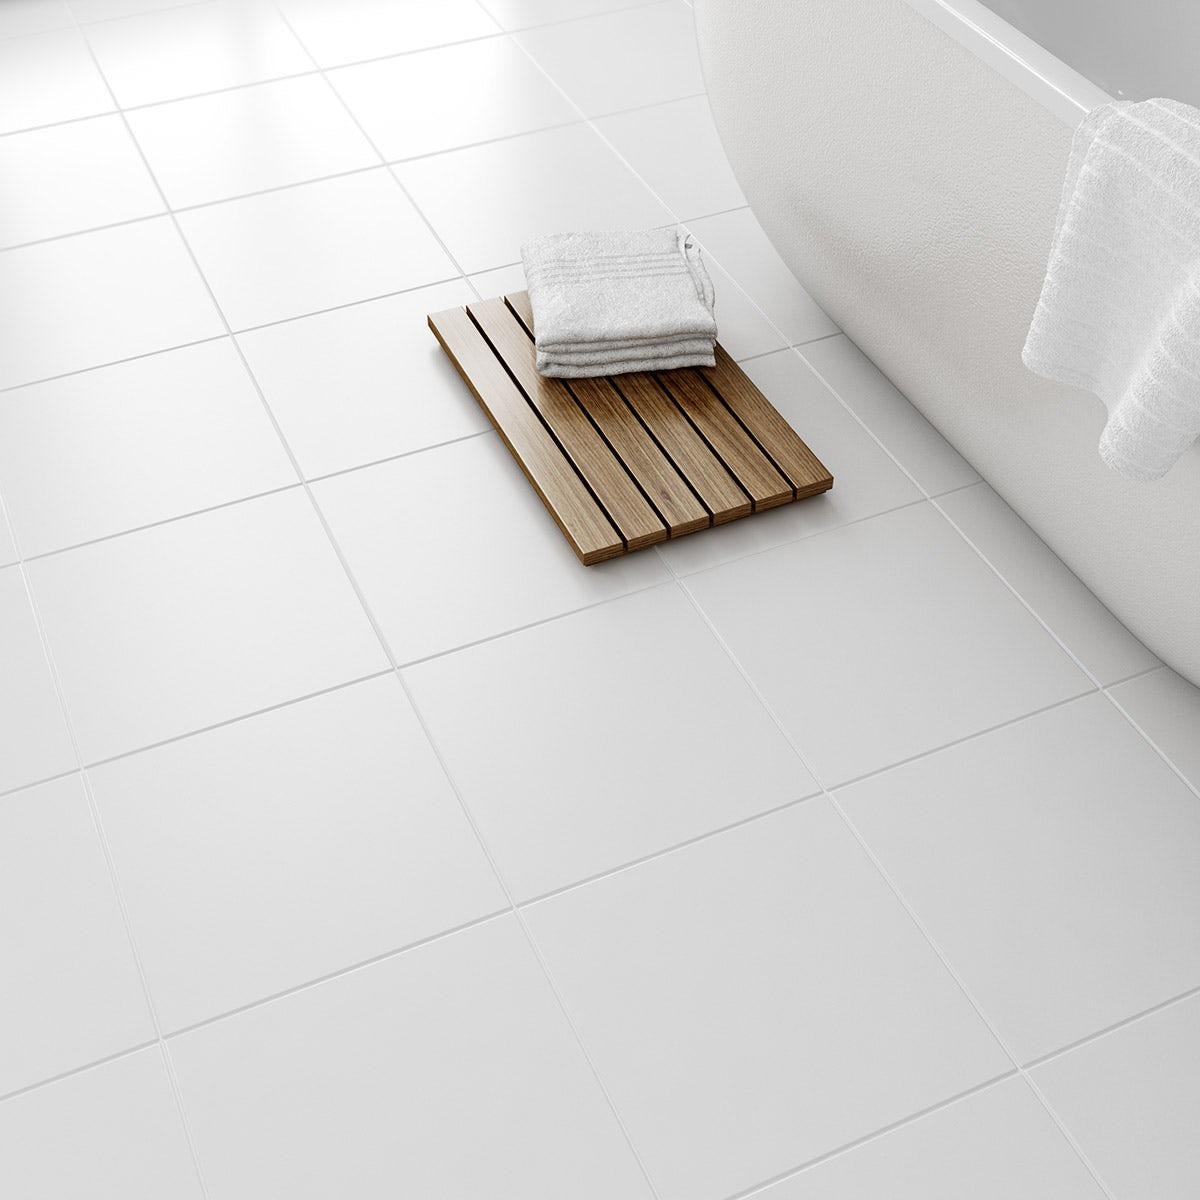 Bathroom floor tiles bathroom floor tiles uk victoriaplum laura ashley white satin floor tile 331mm x 331mm dailygadgetfo Choice Image